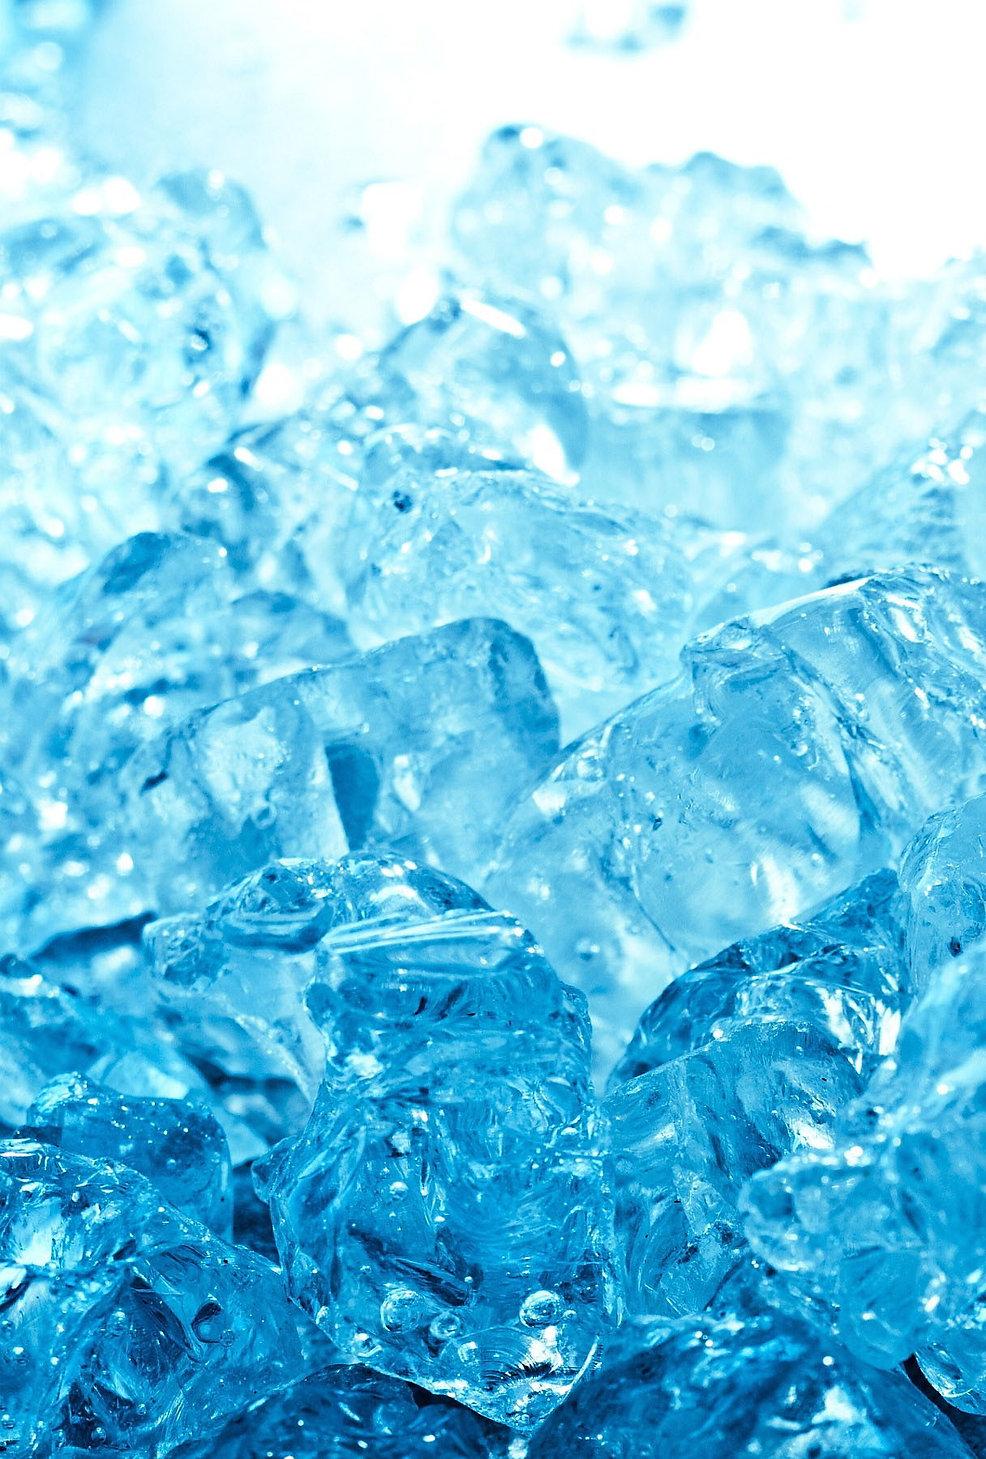 Ice fondo.jpg